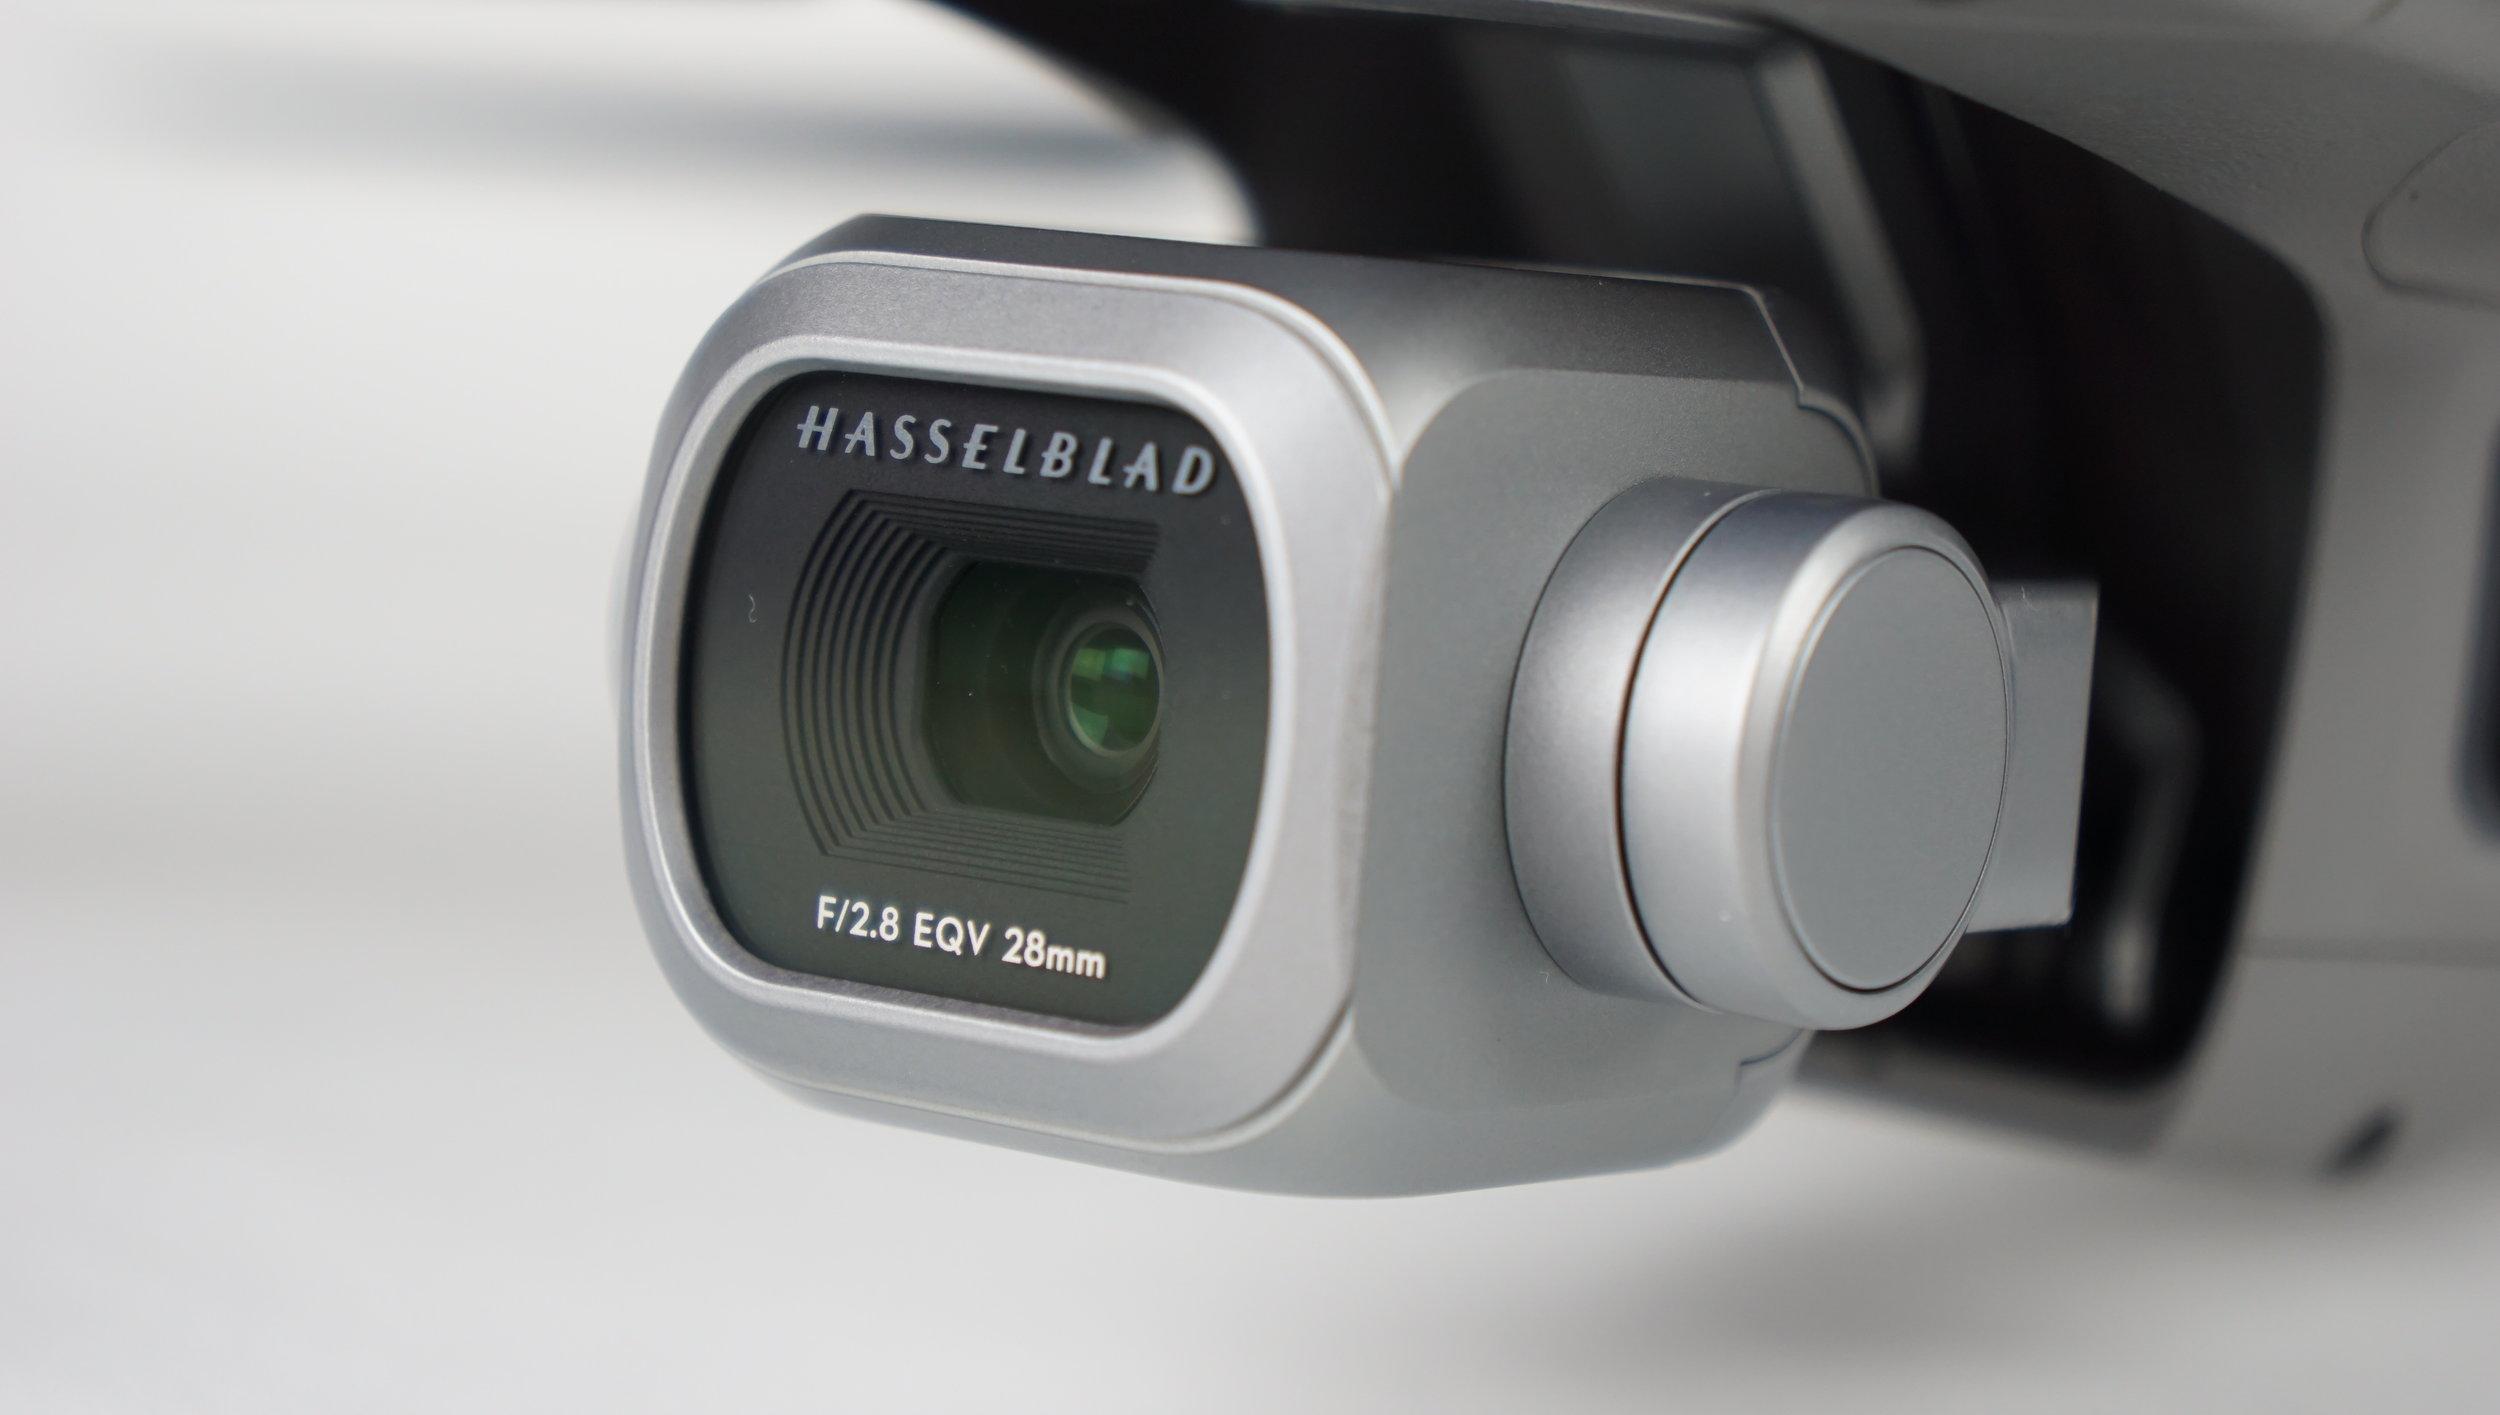 Mavic-2-Pro-camera.jpg